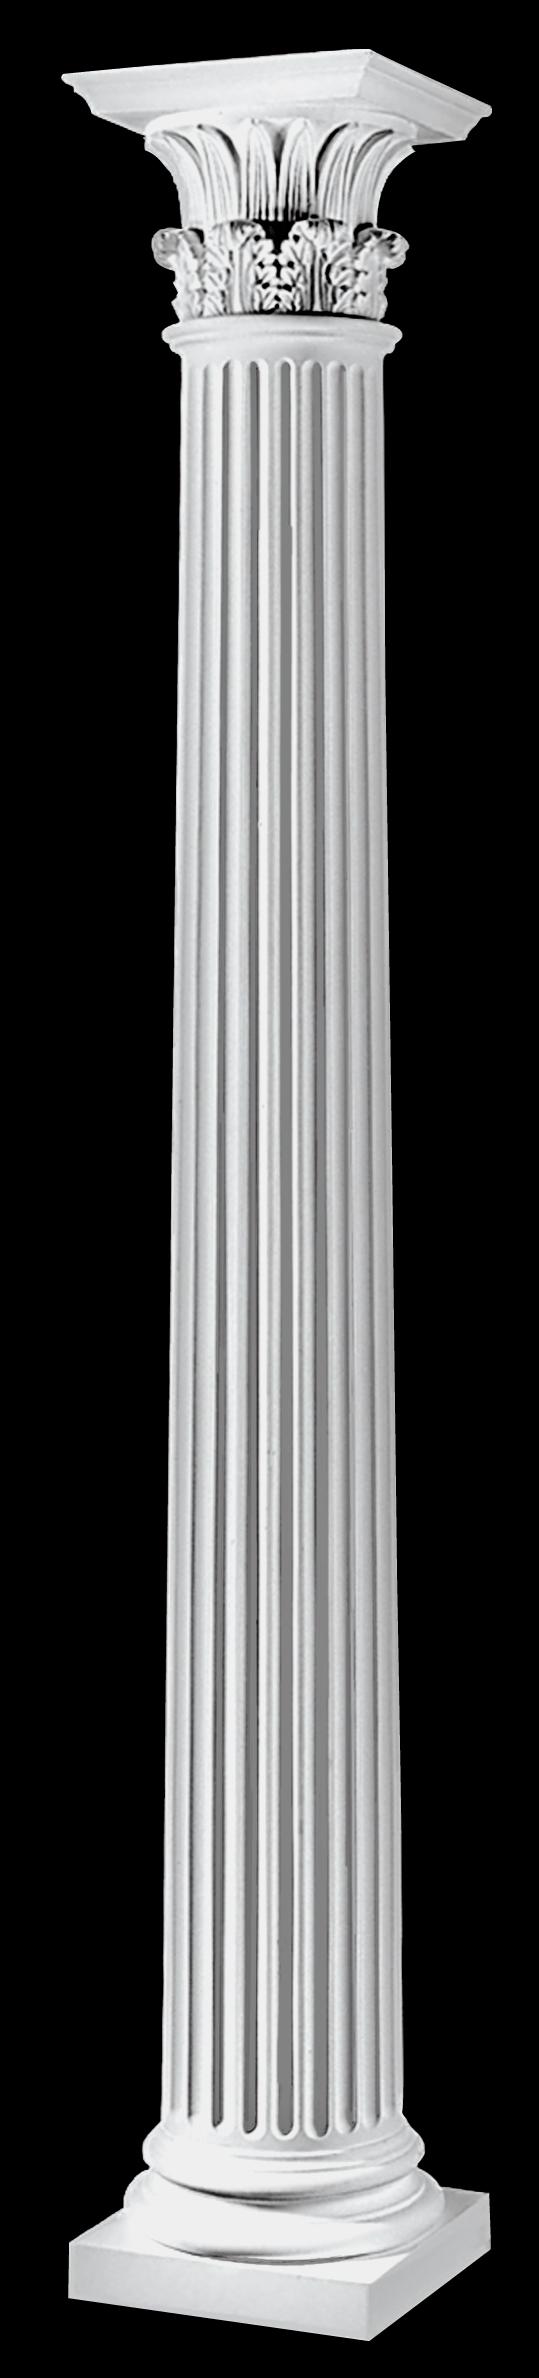 Fluted columns polystone columns greek corinthian columns for Fluted fiberglass columns